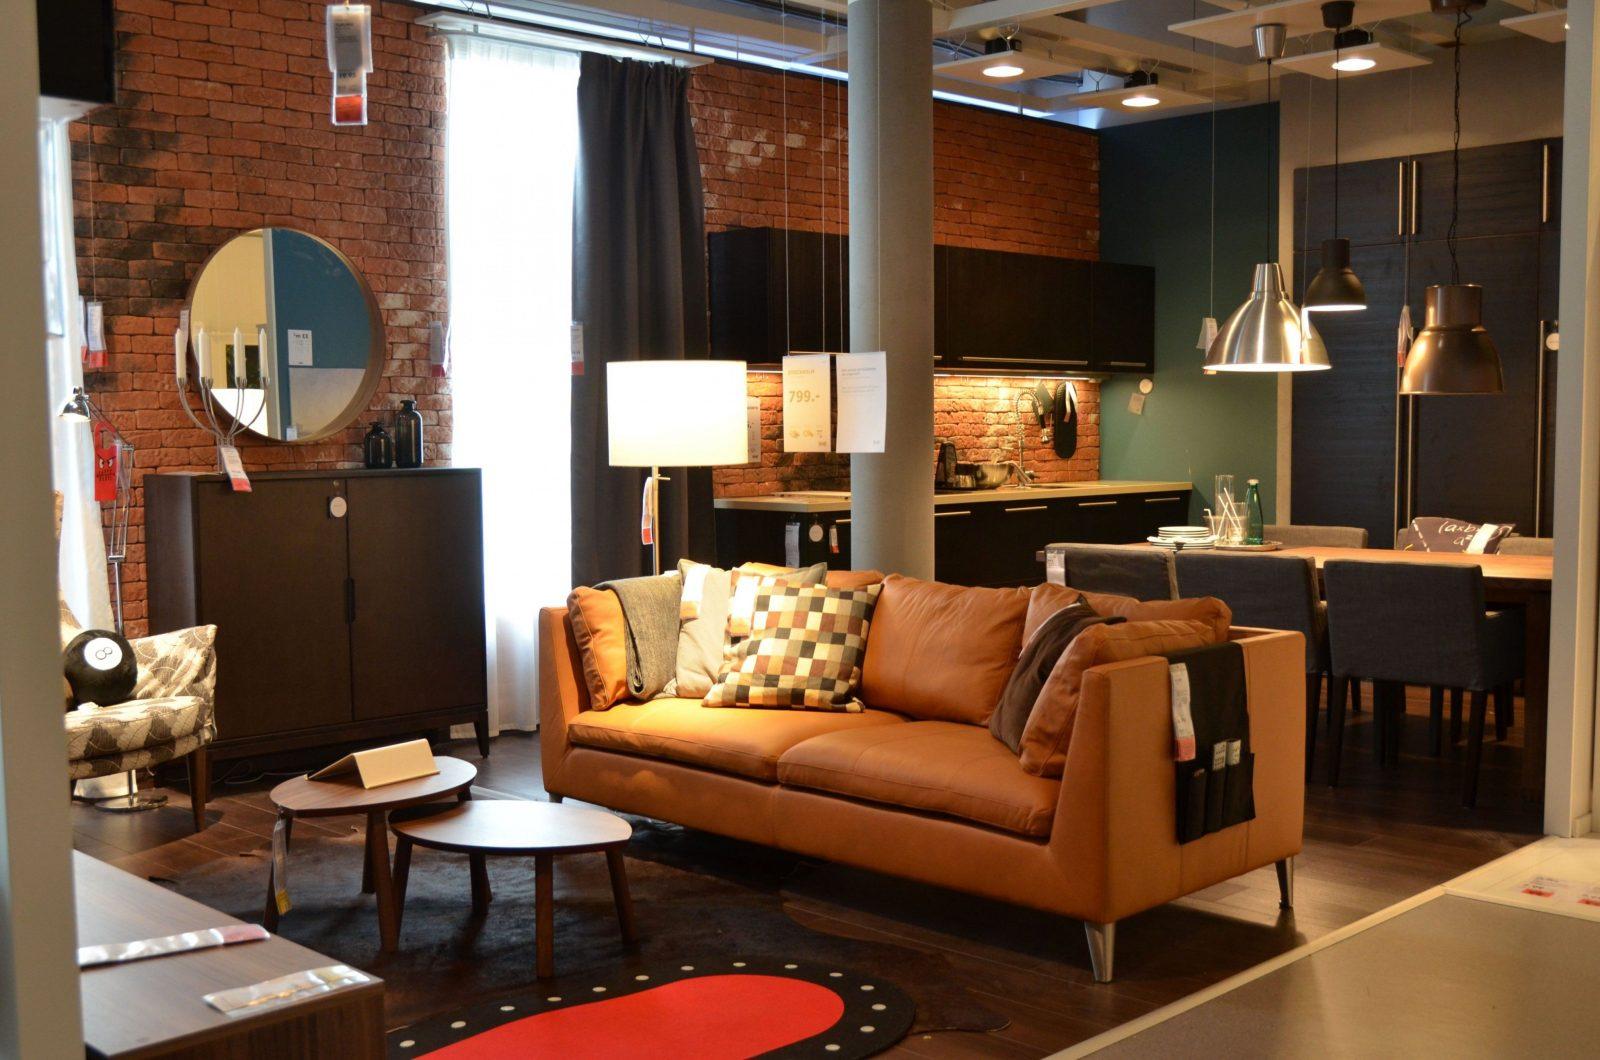 Neueste Ikea Delft Living Room Stockholm Leather Sofa Für Sofa von Ikea Stockholm Sofa Leder Photo